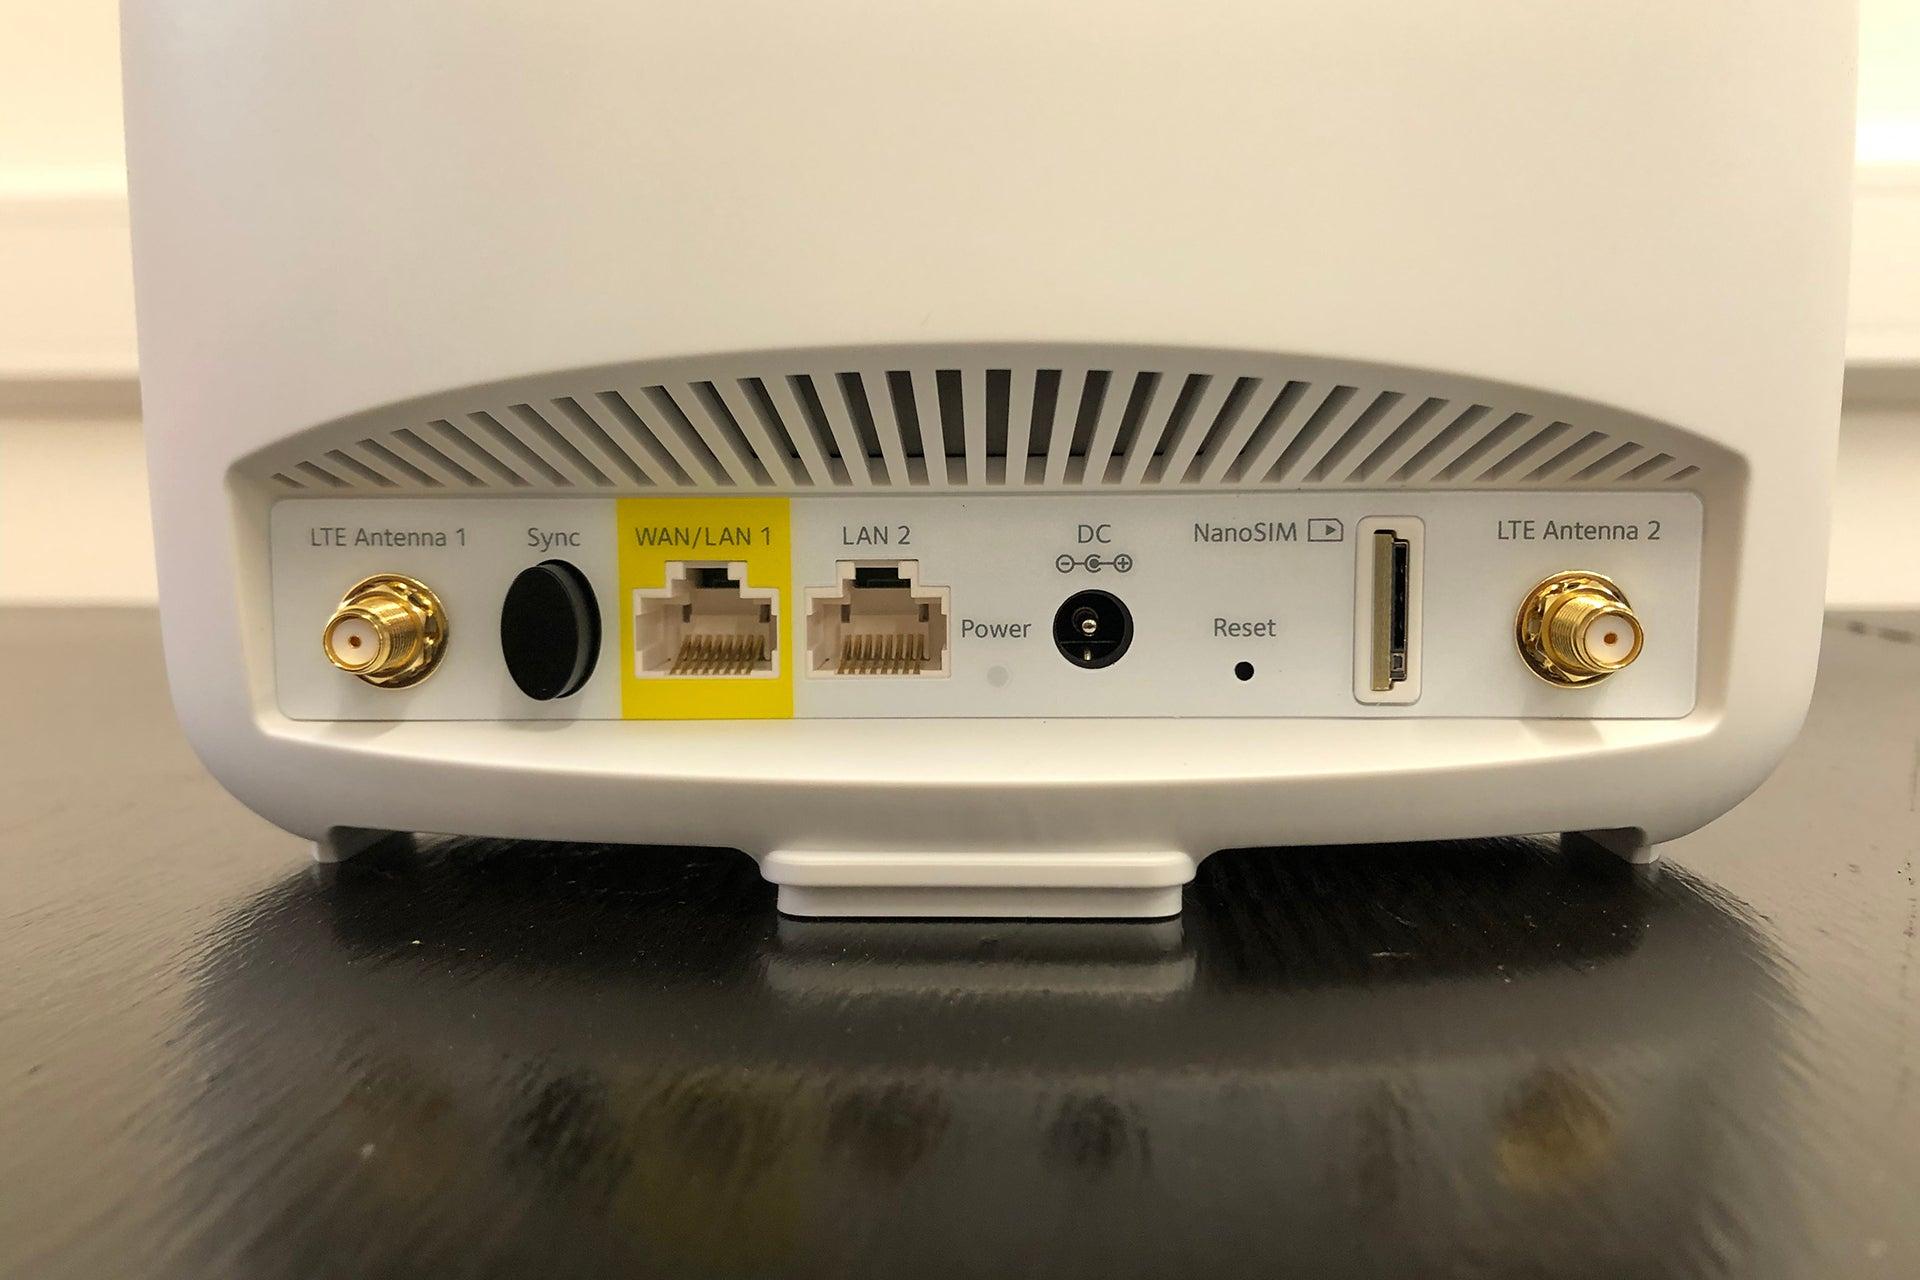 Netgear Orbi 4G LTE (LBR20) rear